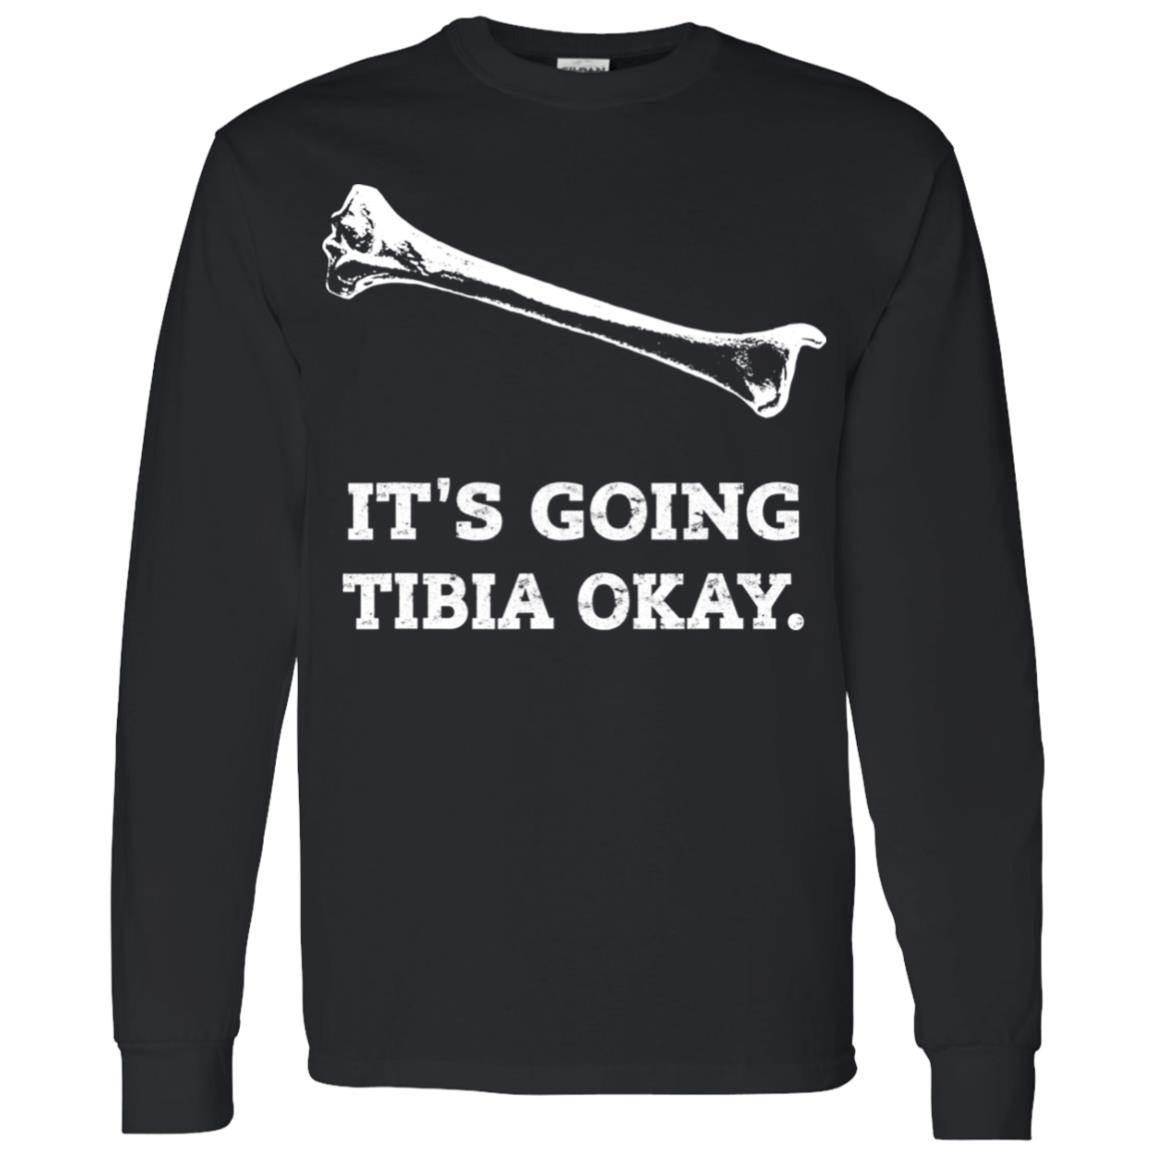 X-Ray Tech – It's Going Tibia Okay. Funny Radiology T-Shirt